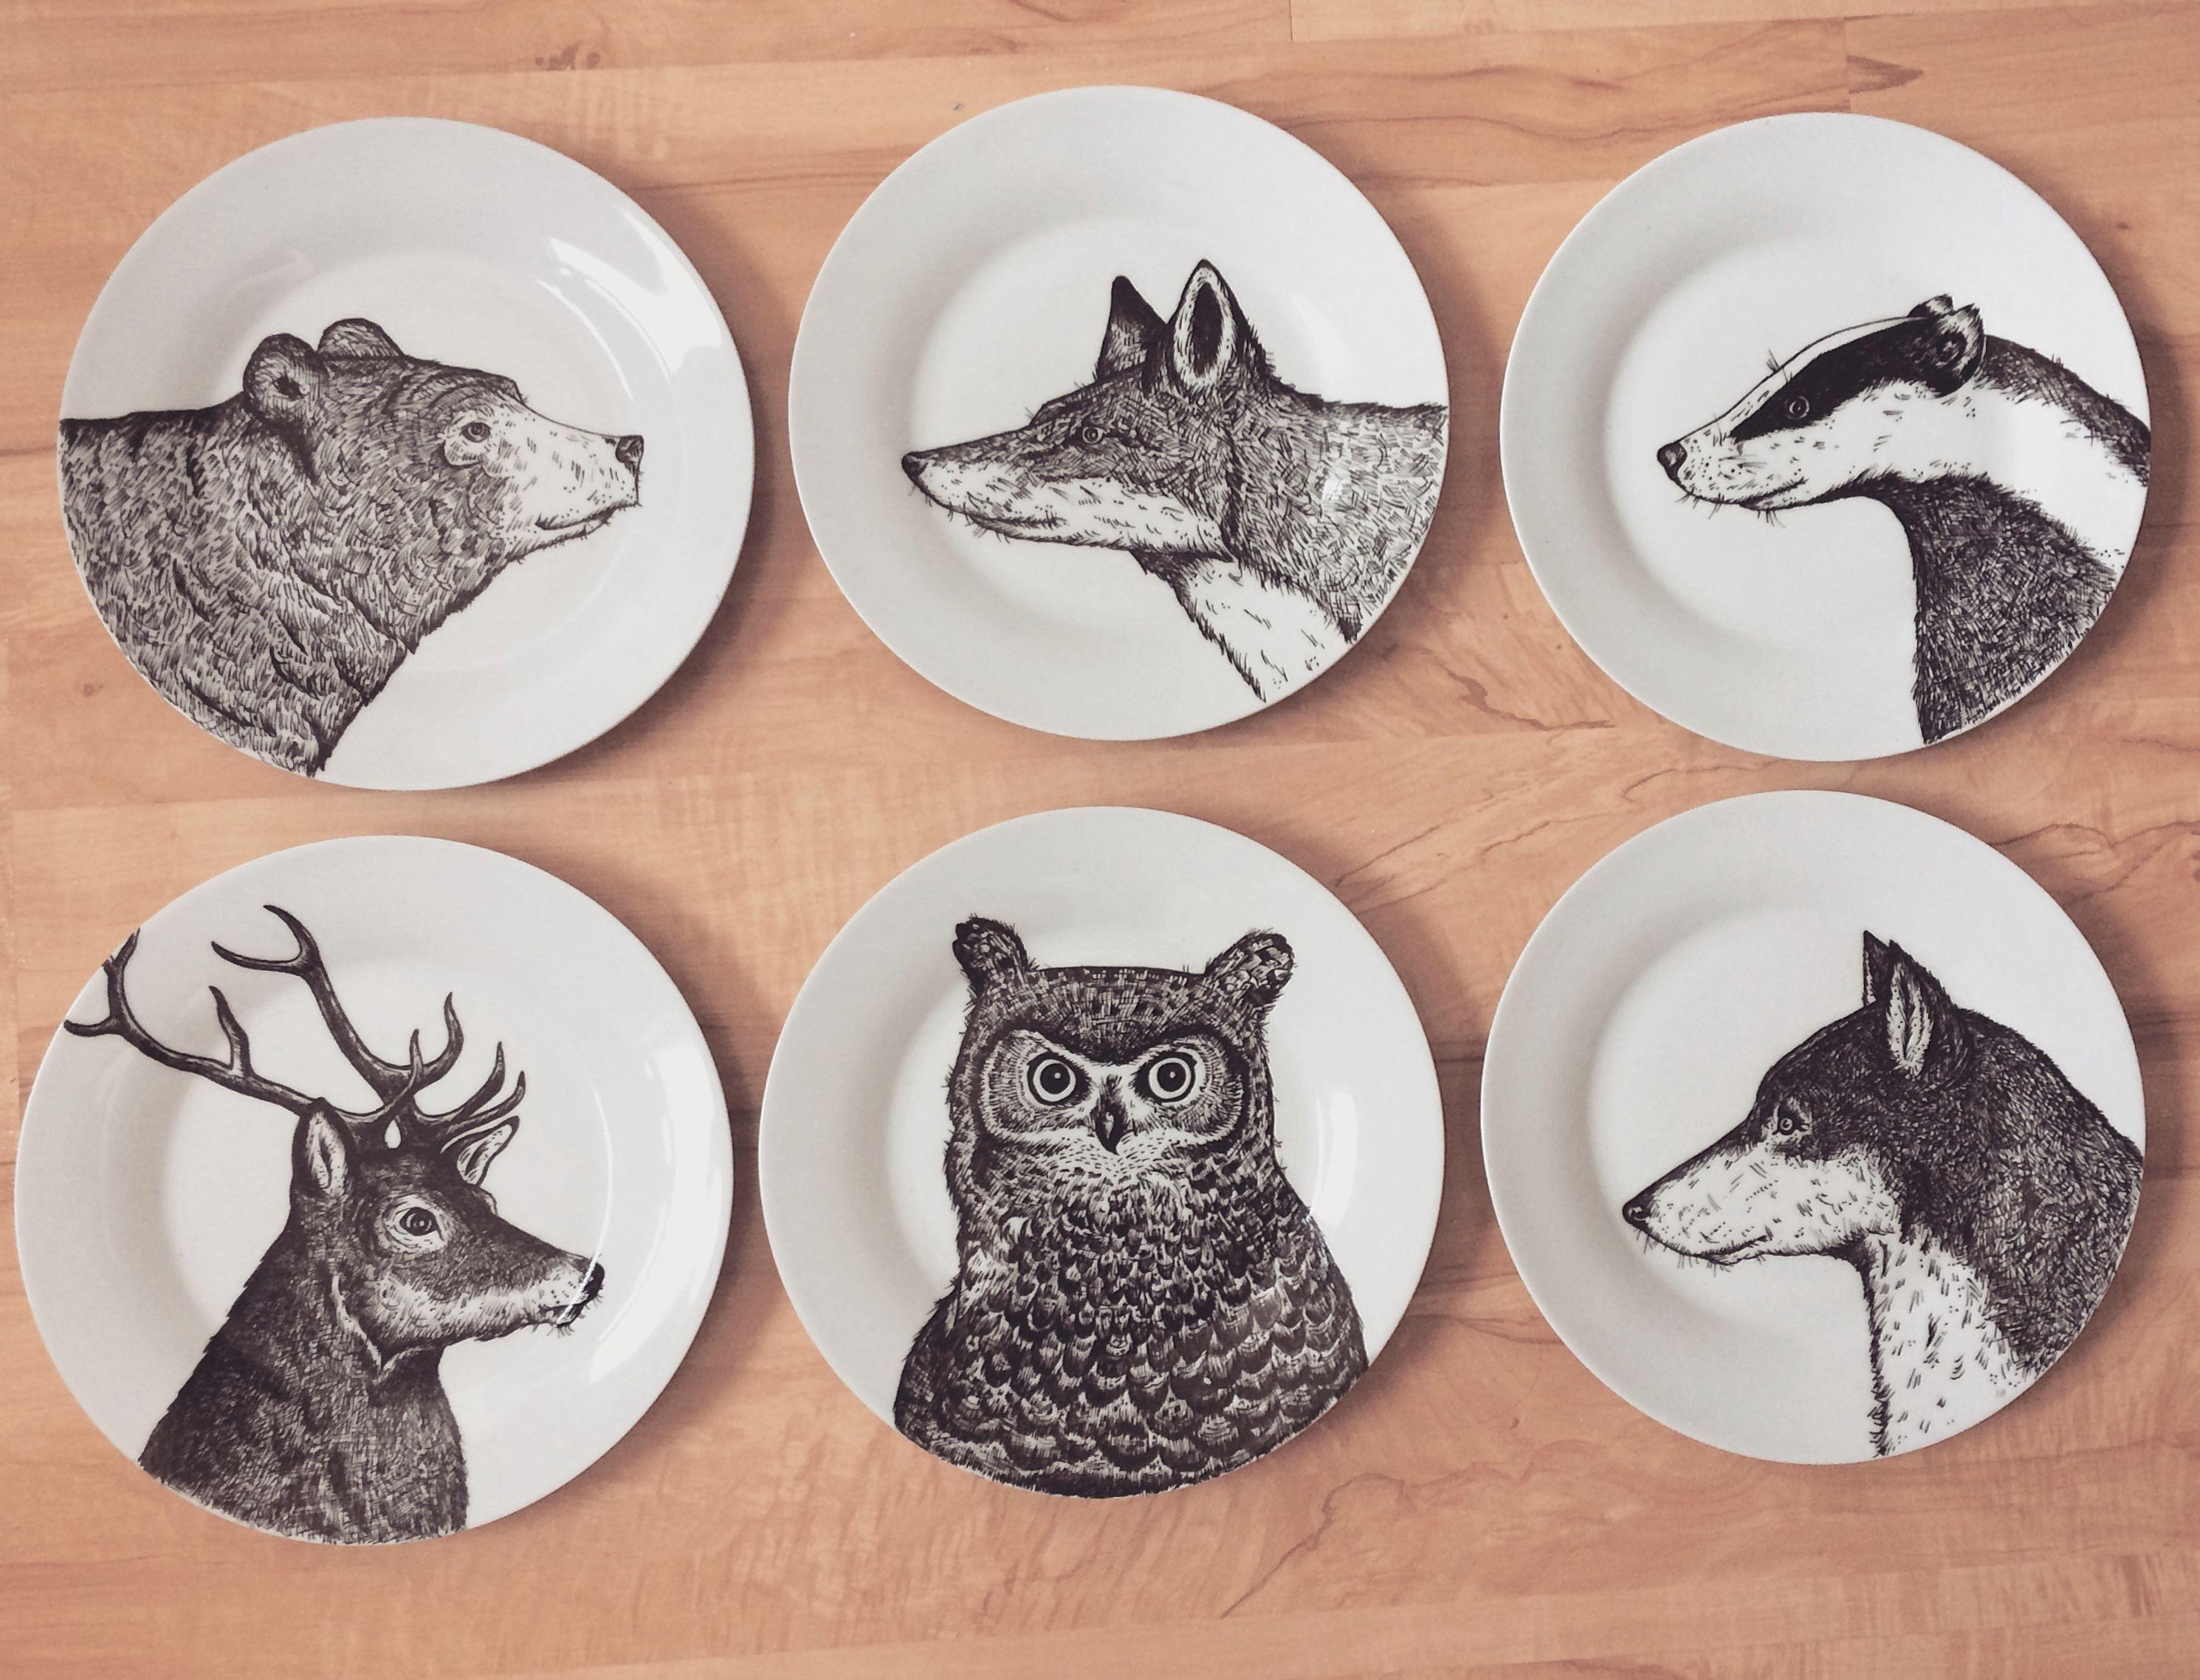 6 Plate Set Dinner Plates Hand Illustrated Hand Painted Dish Customised Illustration Custom Order Ceramics Illustratio Kitchen Decor Rustic Decor Animal Plates